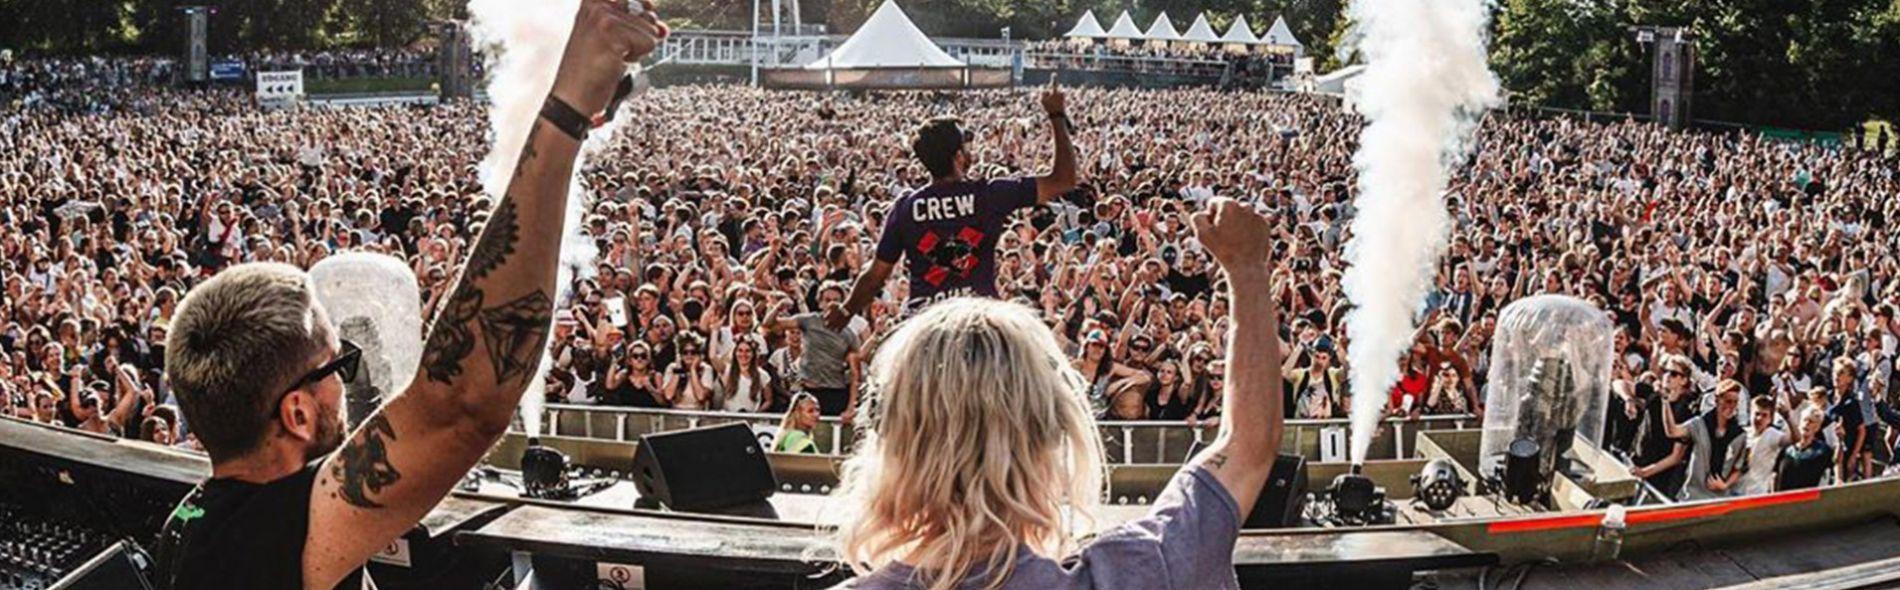 Win VIP tickets voor Kris Kross Amsterdam + meet & greet!